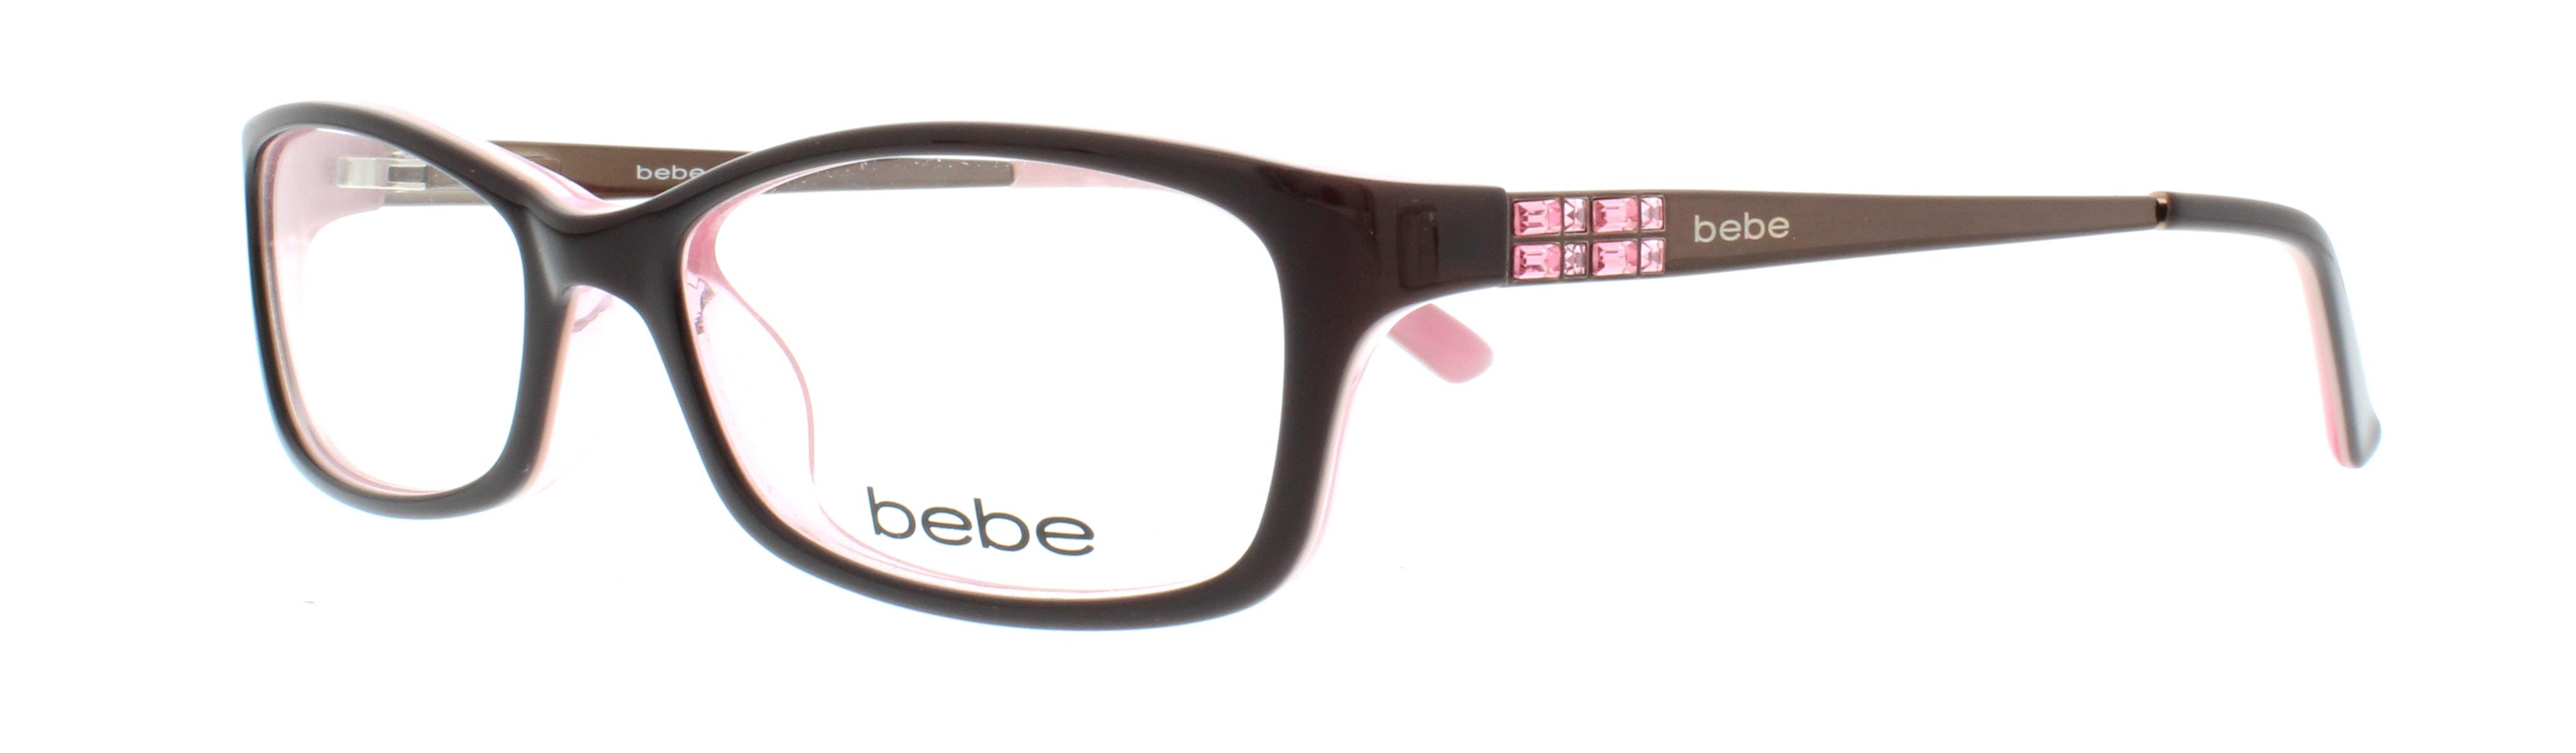 BEBE Eyeglasses BB5044 ENVY 607 Brown Rose 53MM 788678515940 | eBay